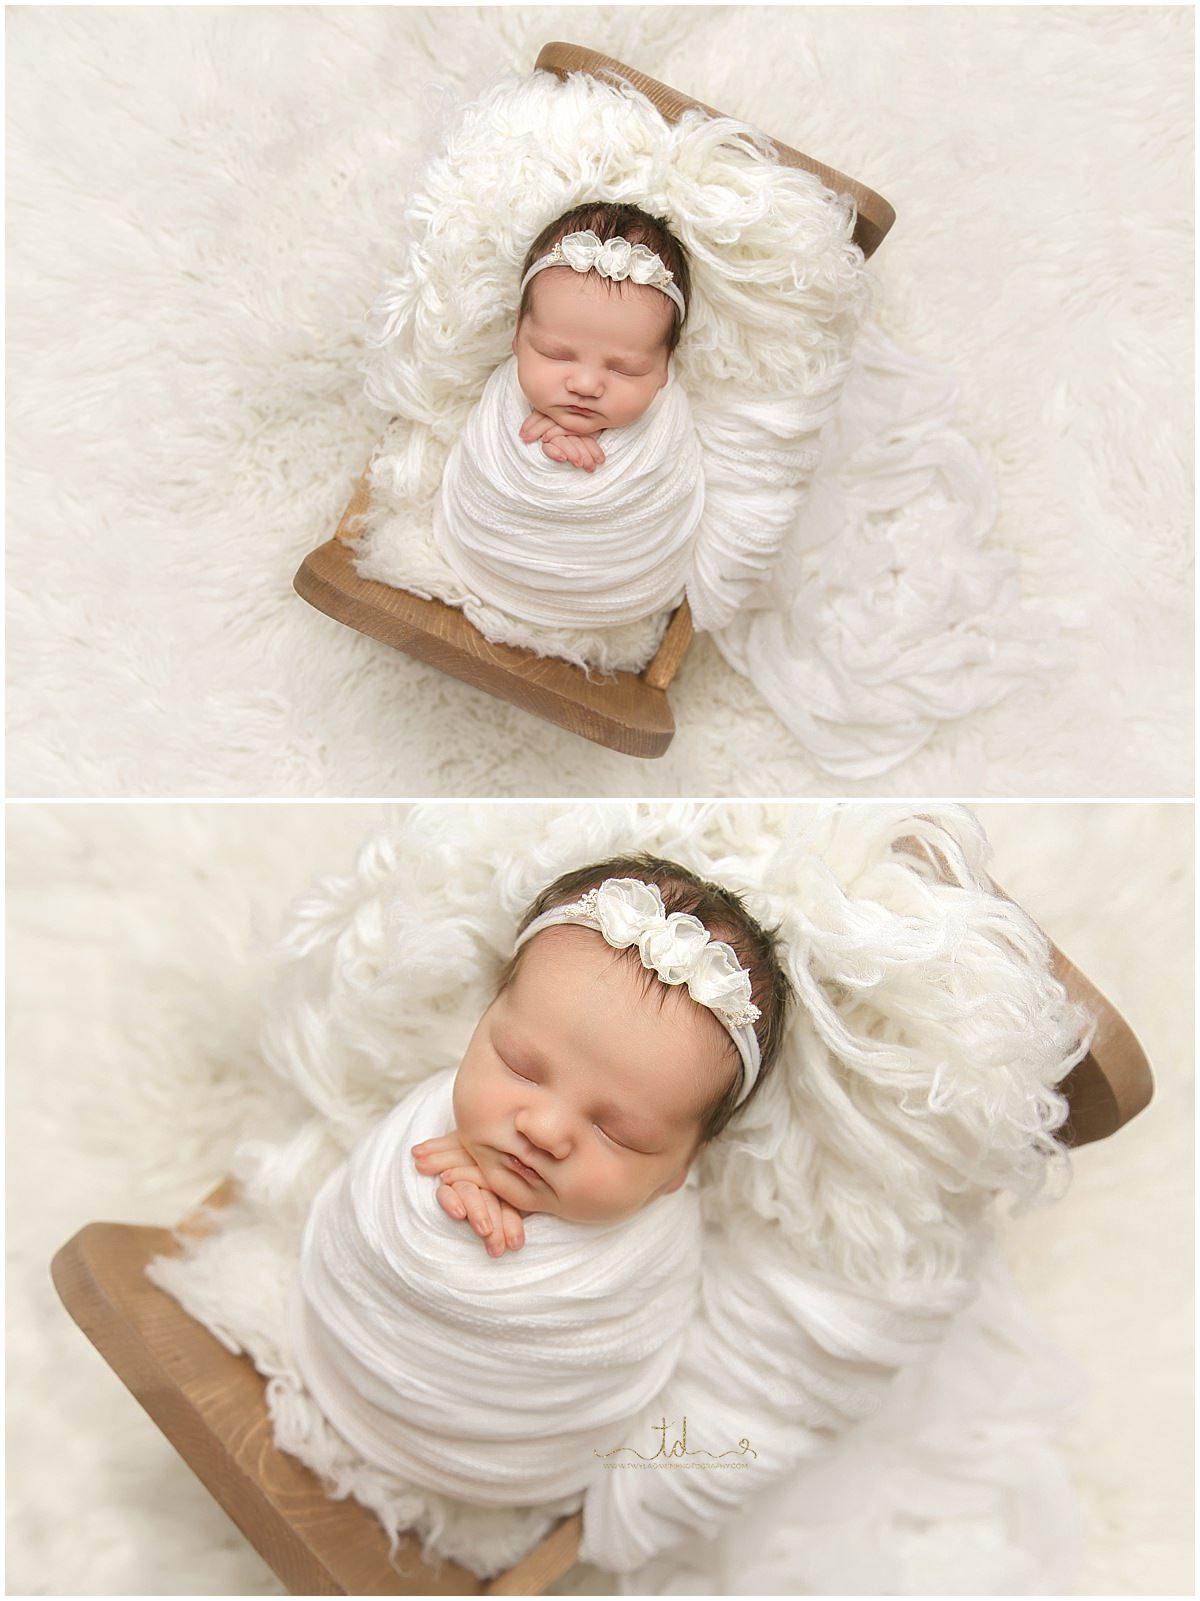 Utah Baby Photographer | Utah Newborn Photographer | Swaddled Prop Posing | #TwylaDawnPhotography